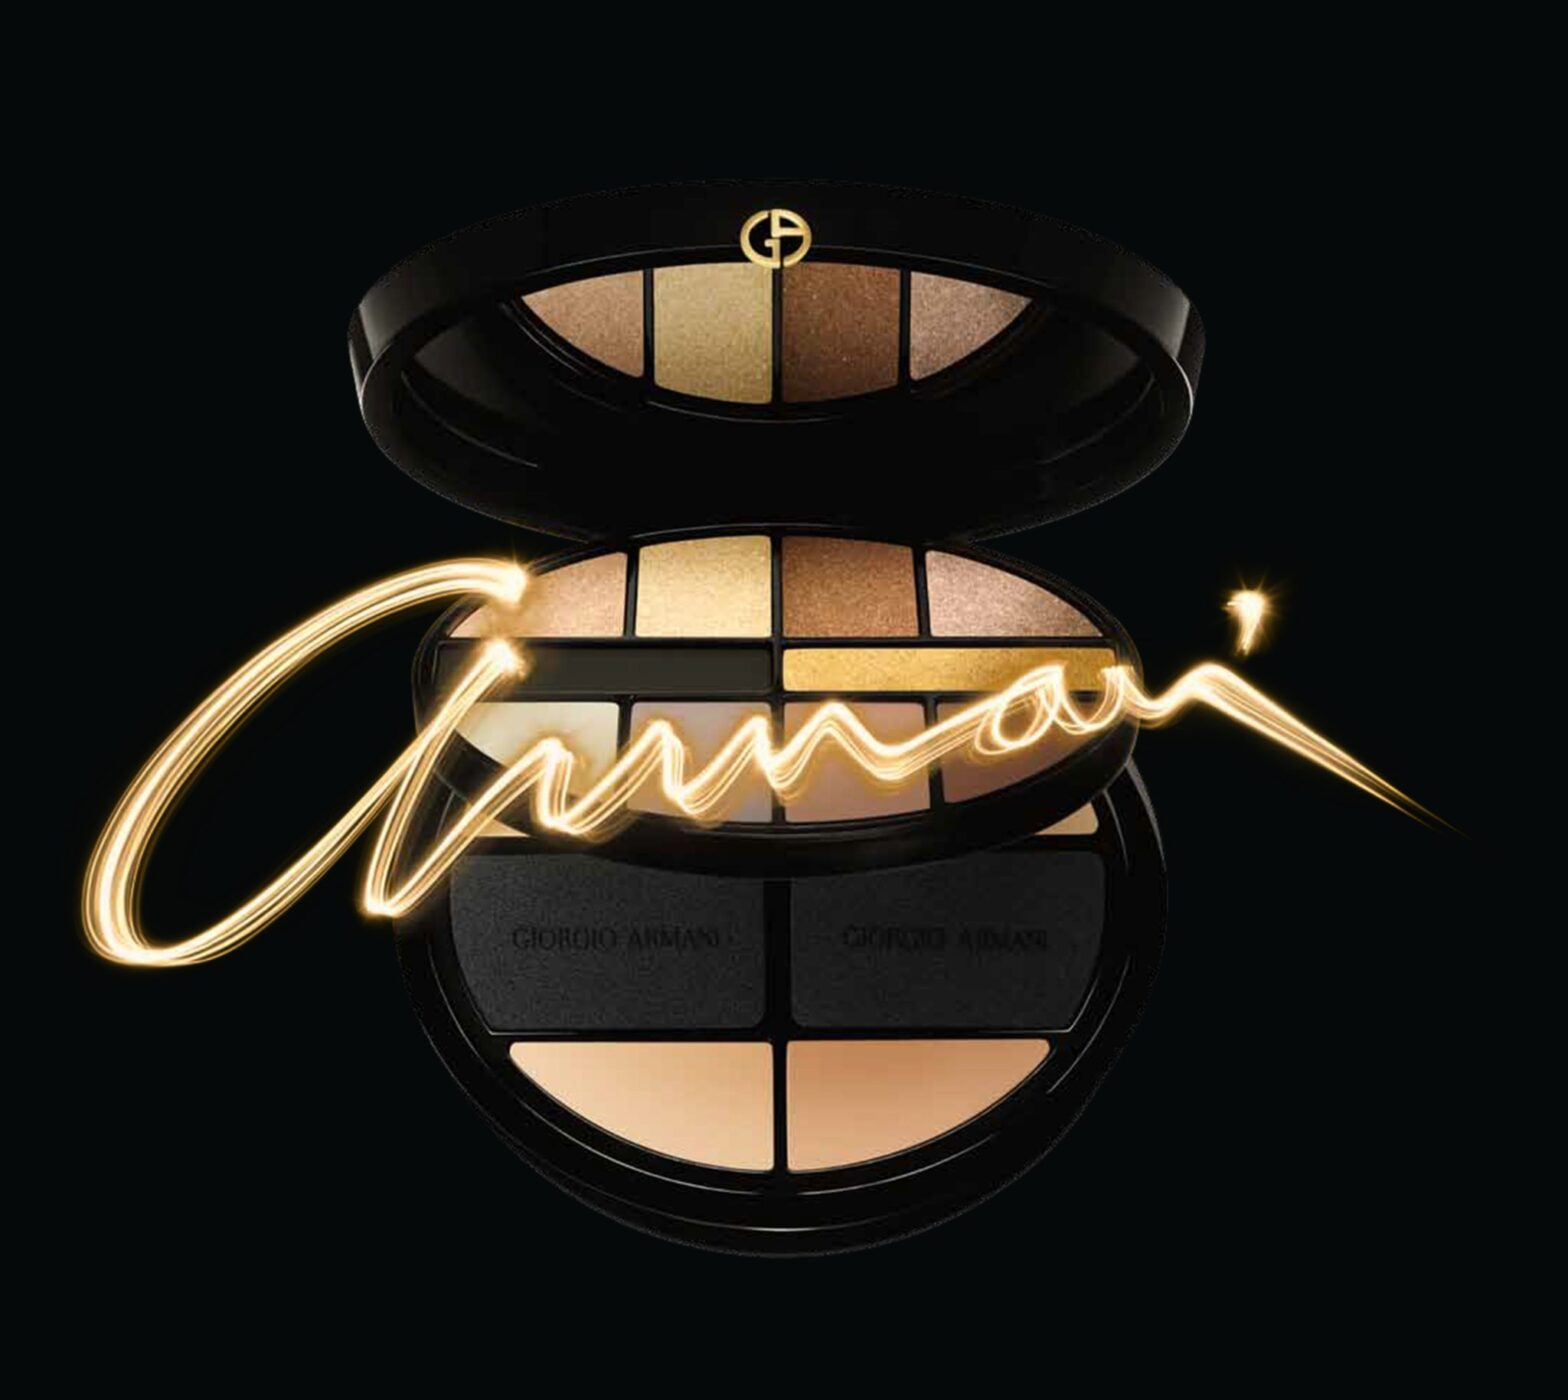 Night lights holiday - Giorgio Armani Beauty Night Light Holiday 2016 Collection